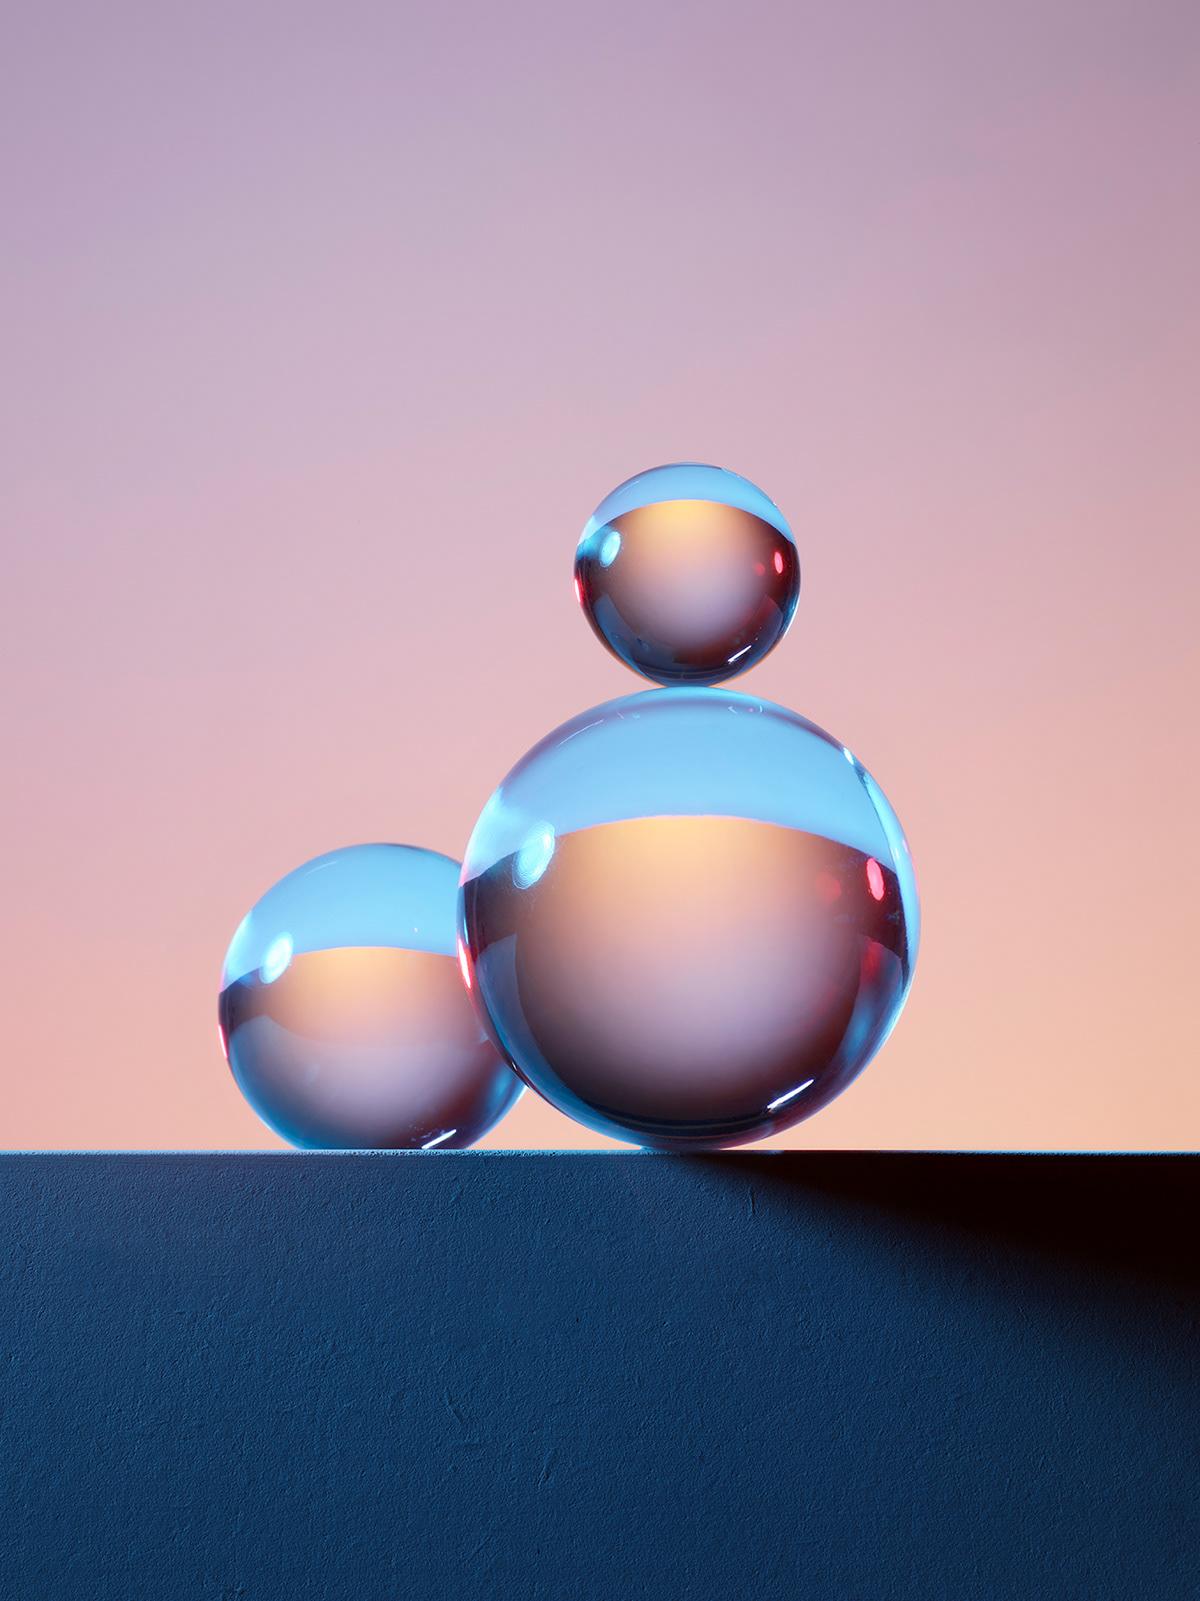 colour elegance equilibrium Fashion  light Magic   modern Photography  product still life